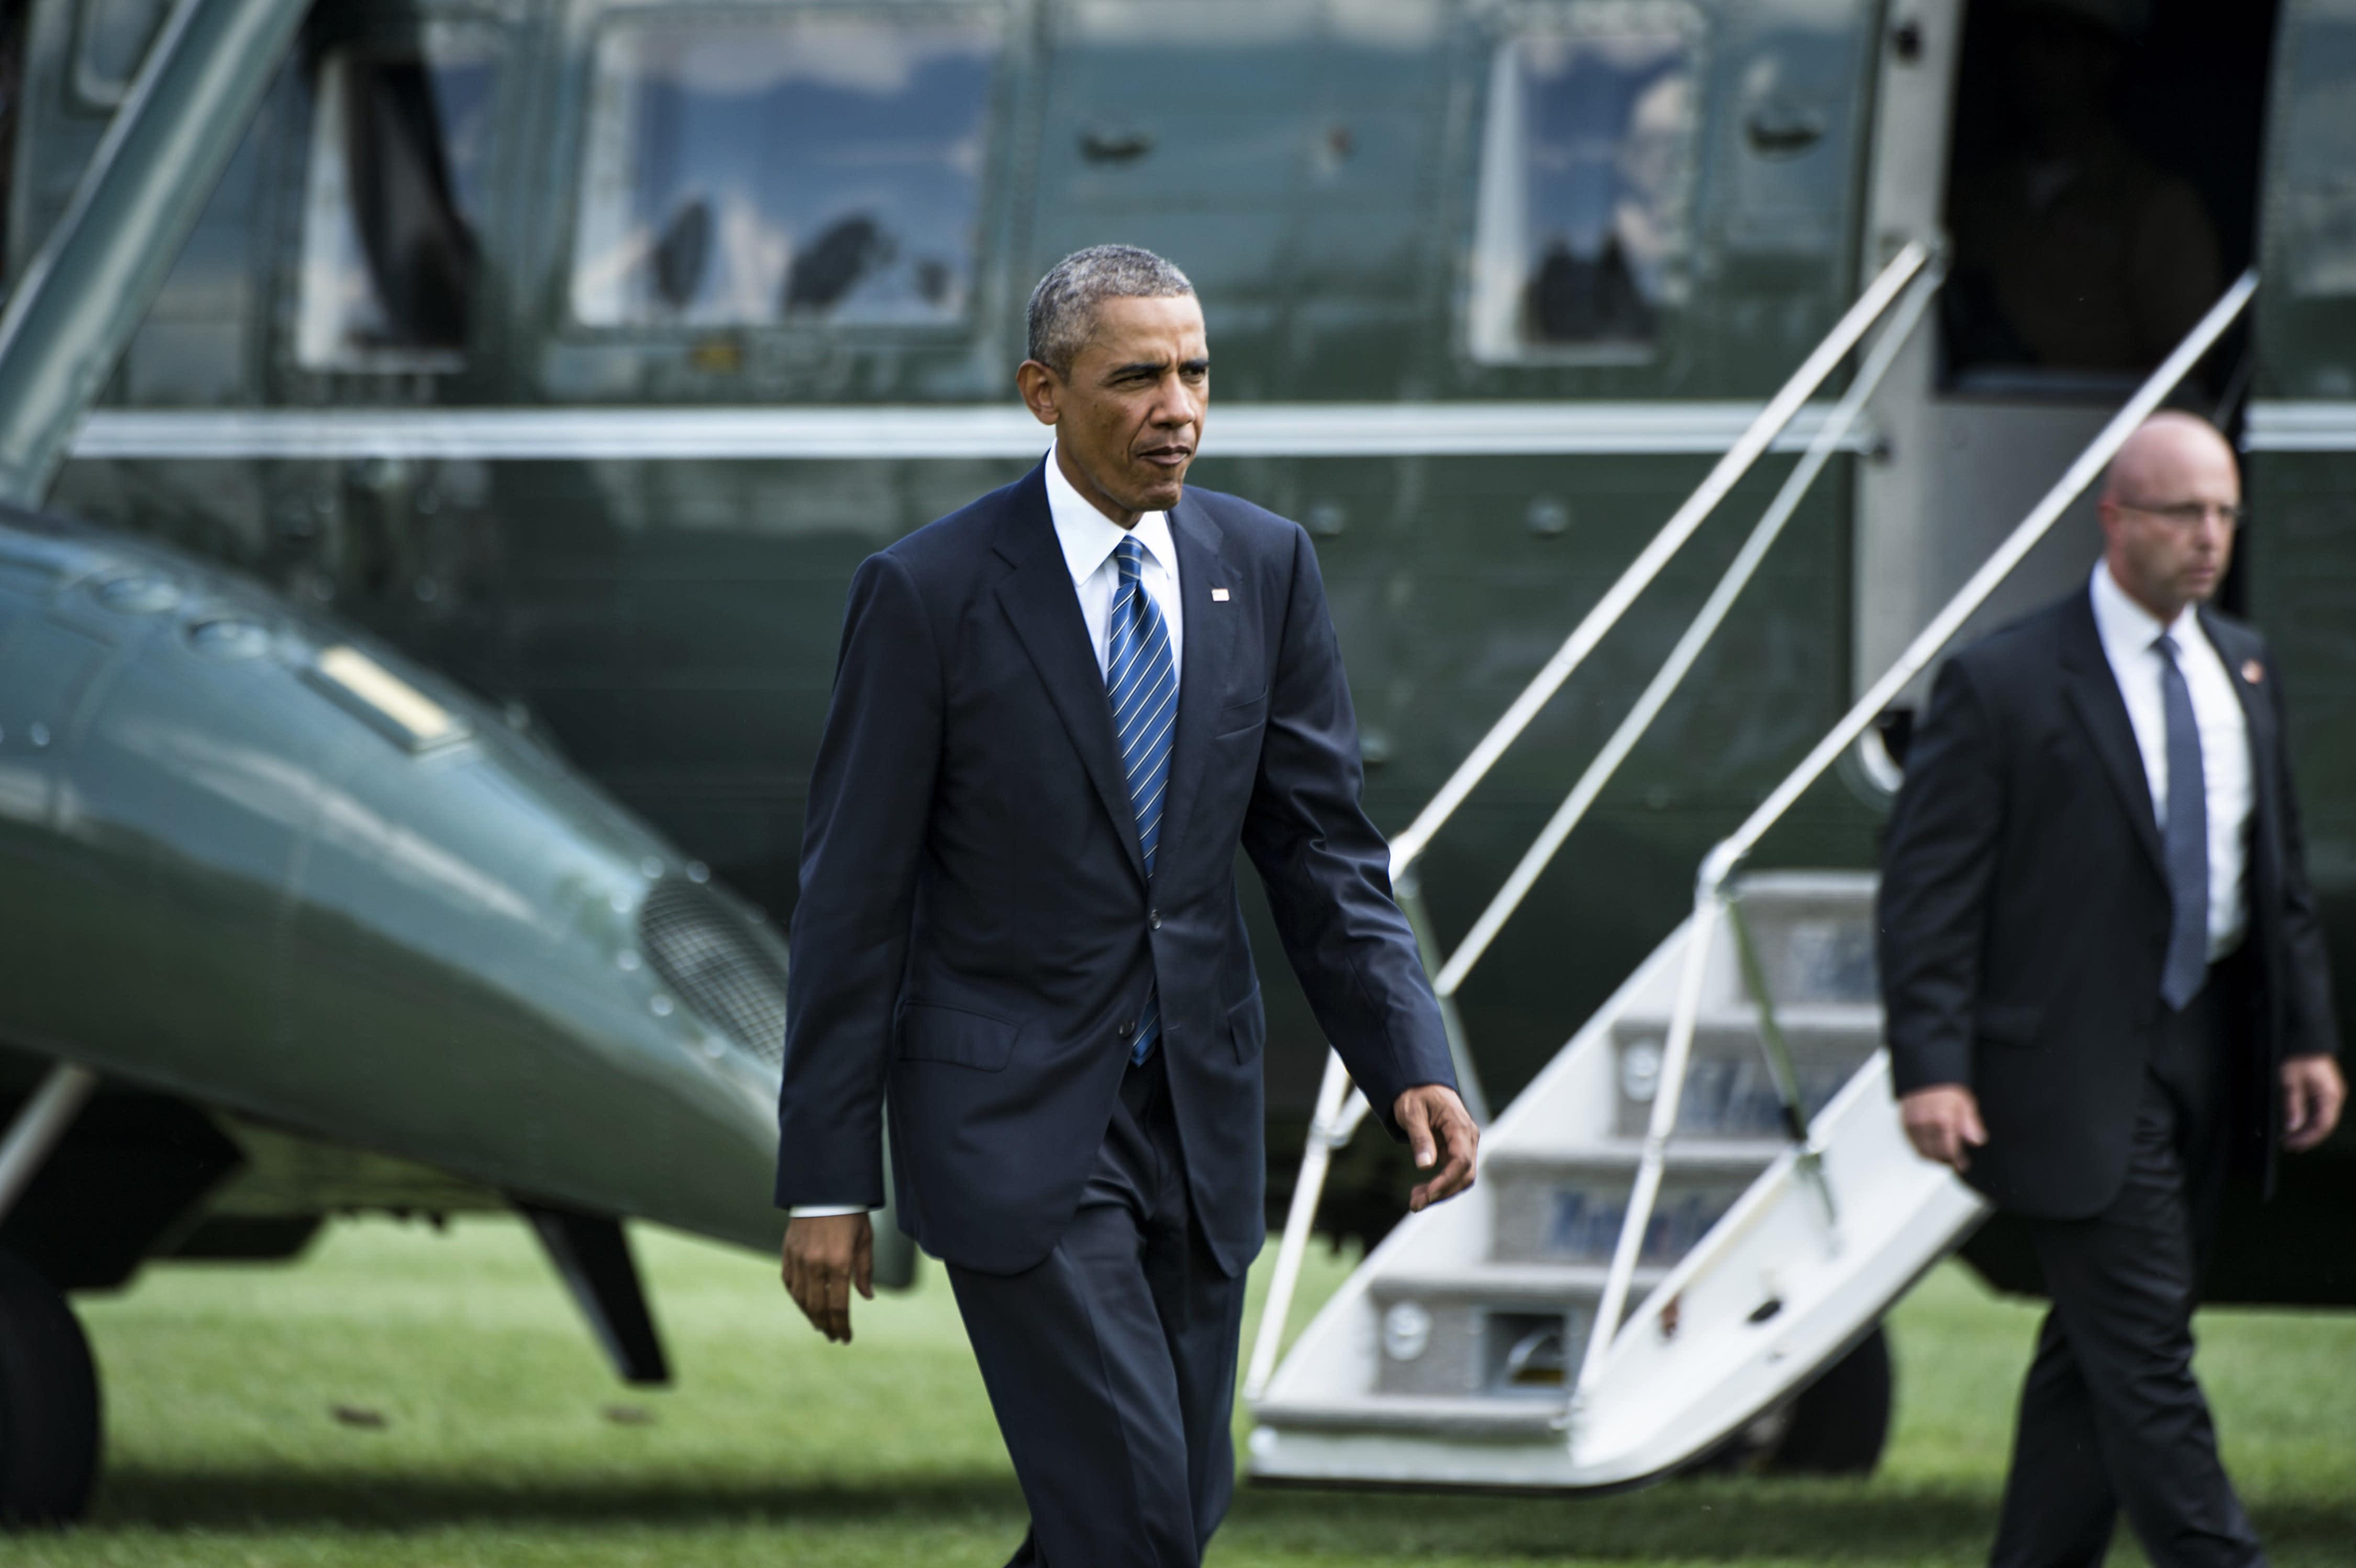 US President Barack Obama at the White House August 26, 2014 in Washington, DC